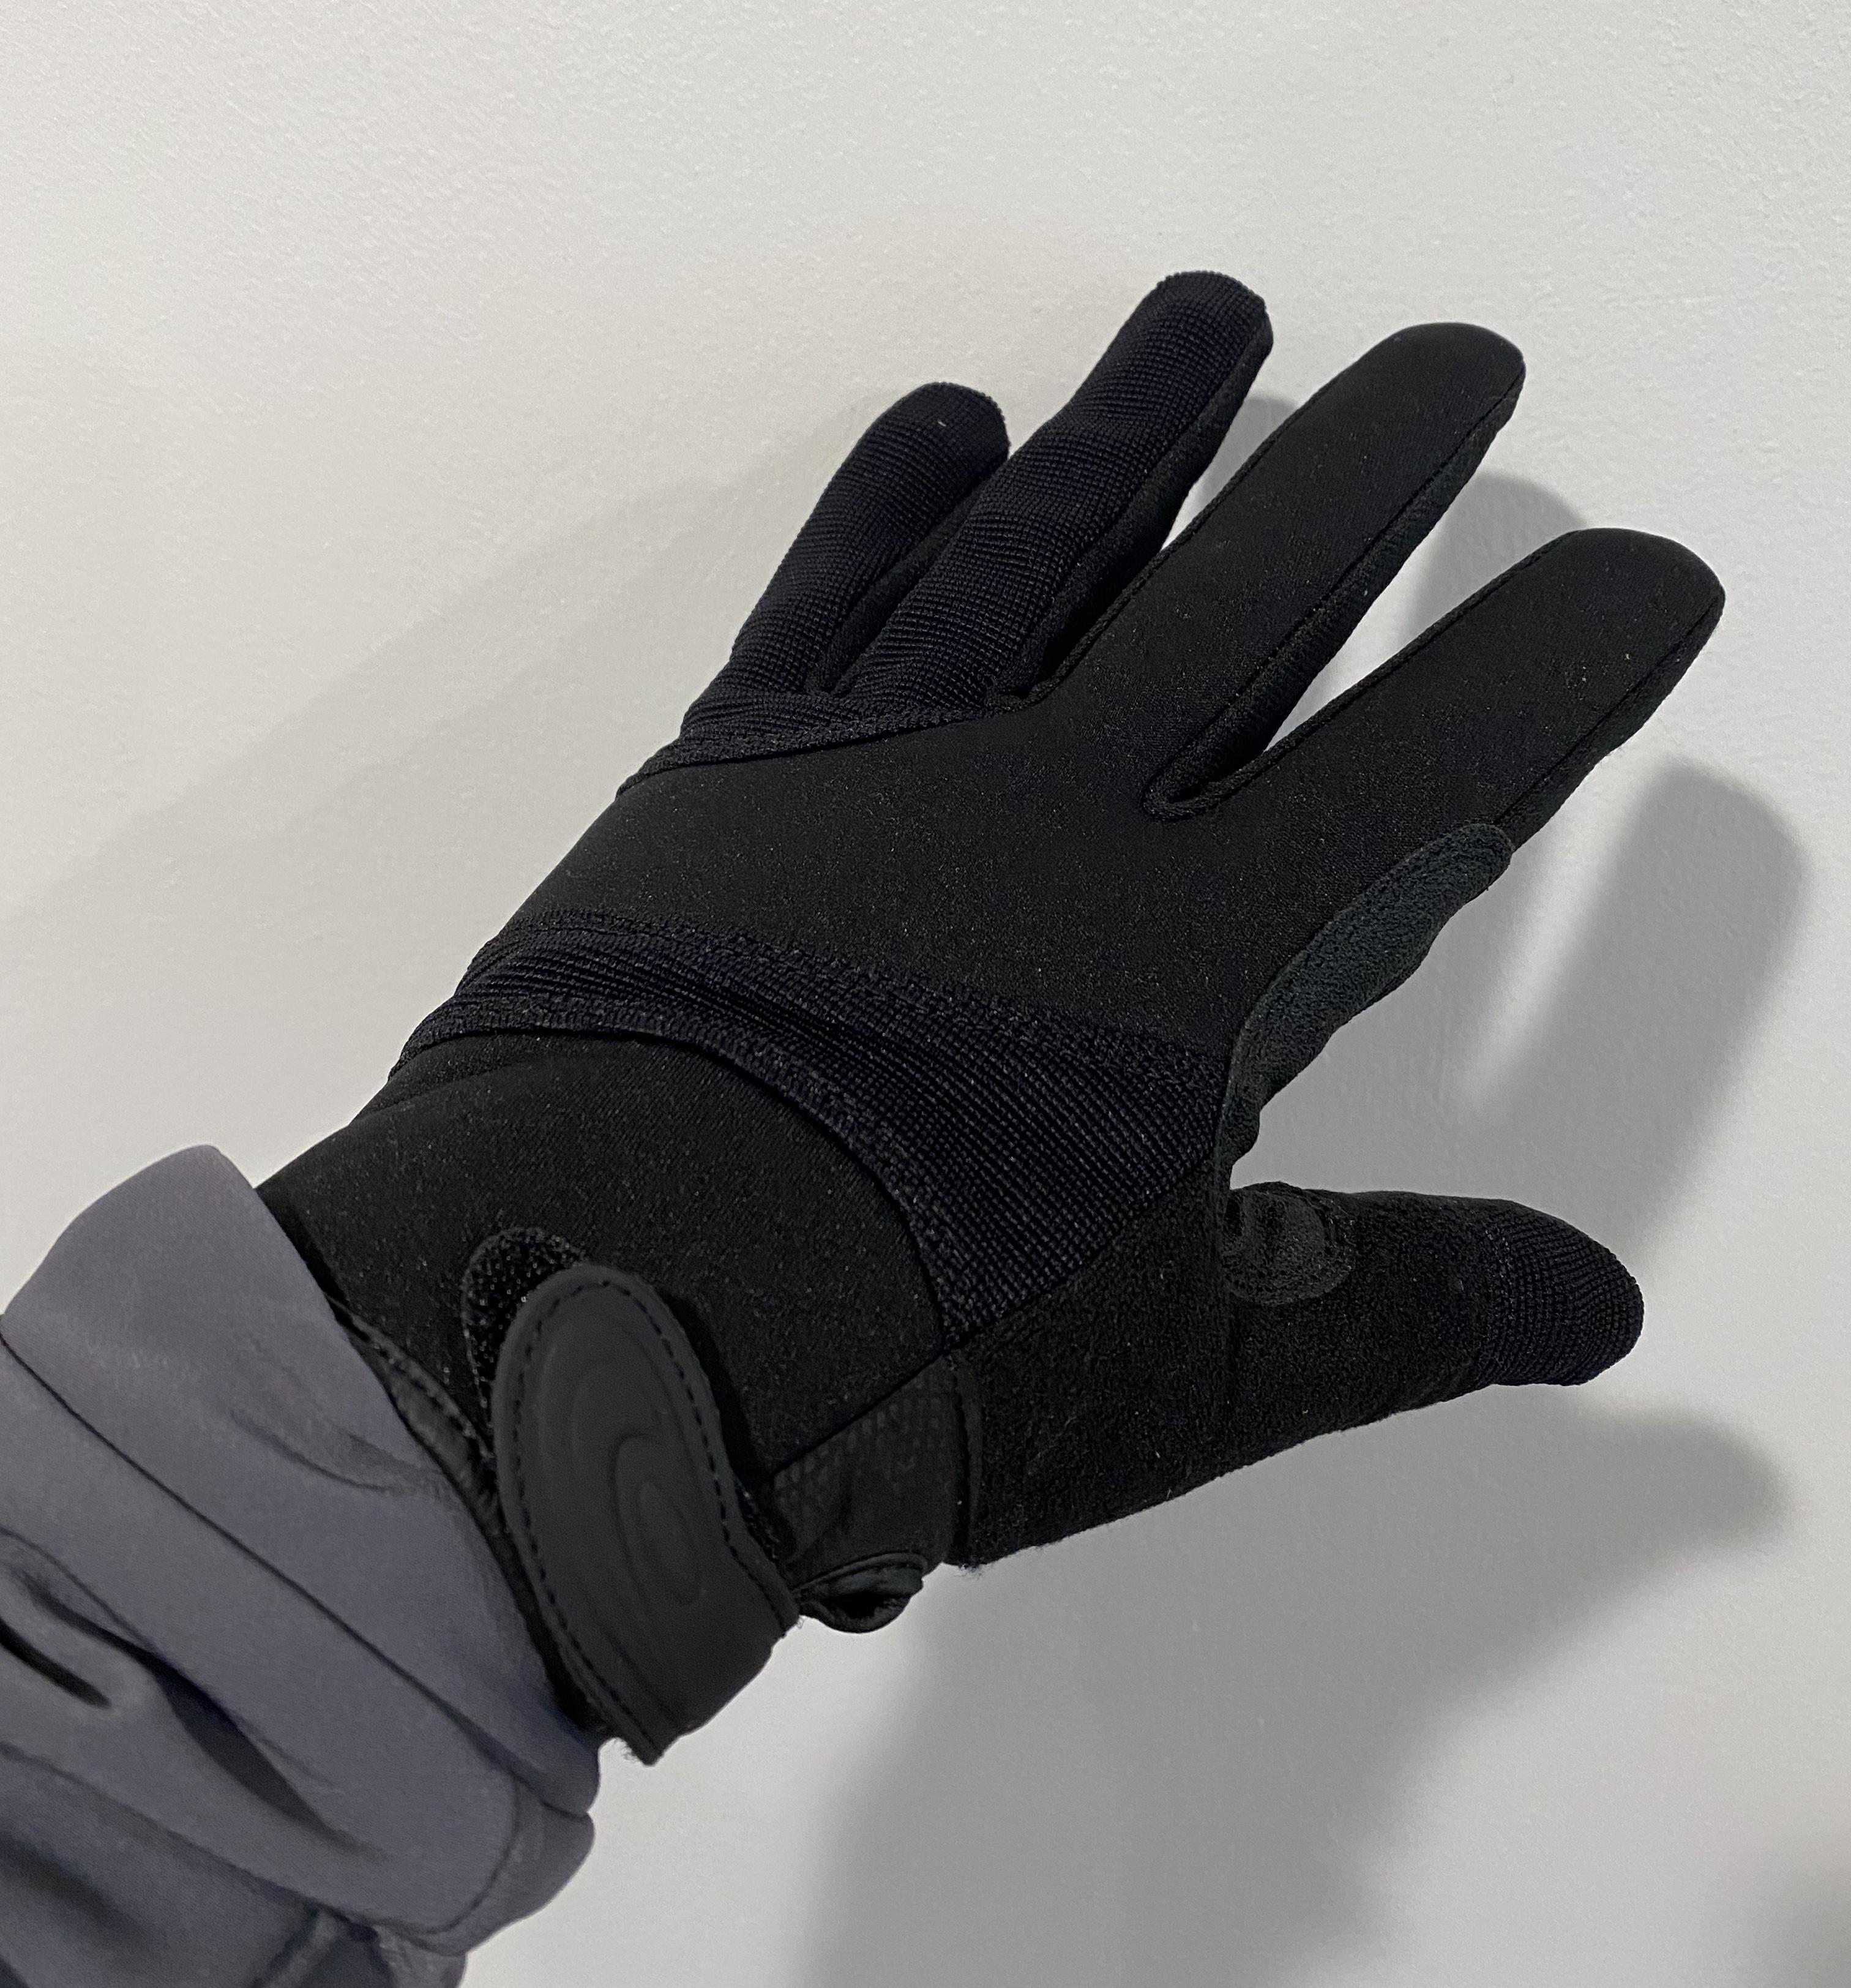 Gloves 1.jpeg